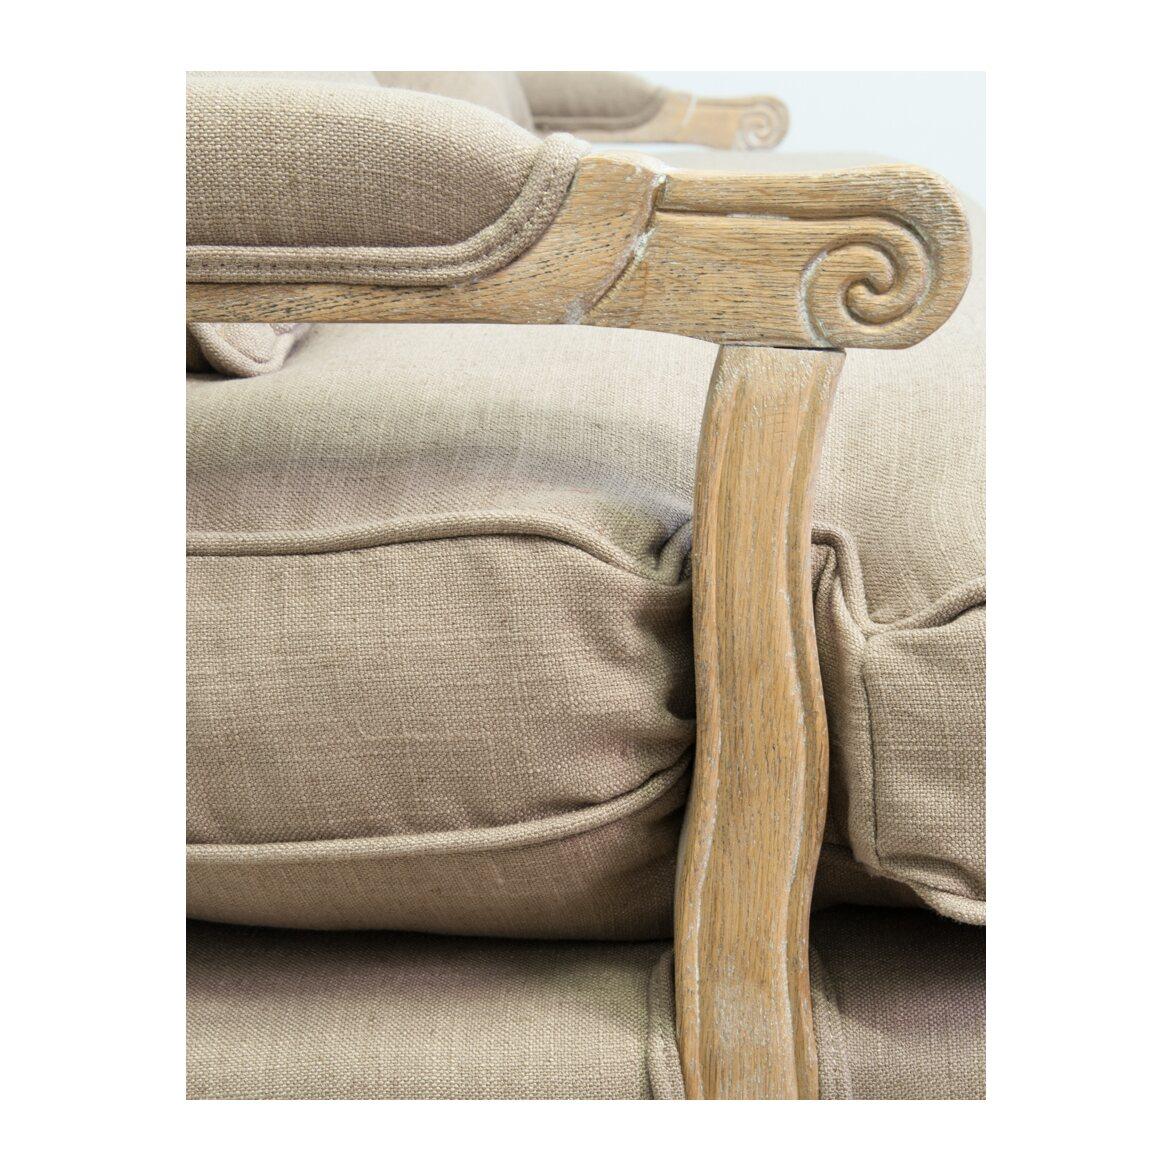 Двухместный диван Yareli brown 3   Прямые диваны Kingsby